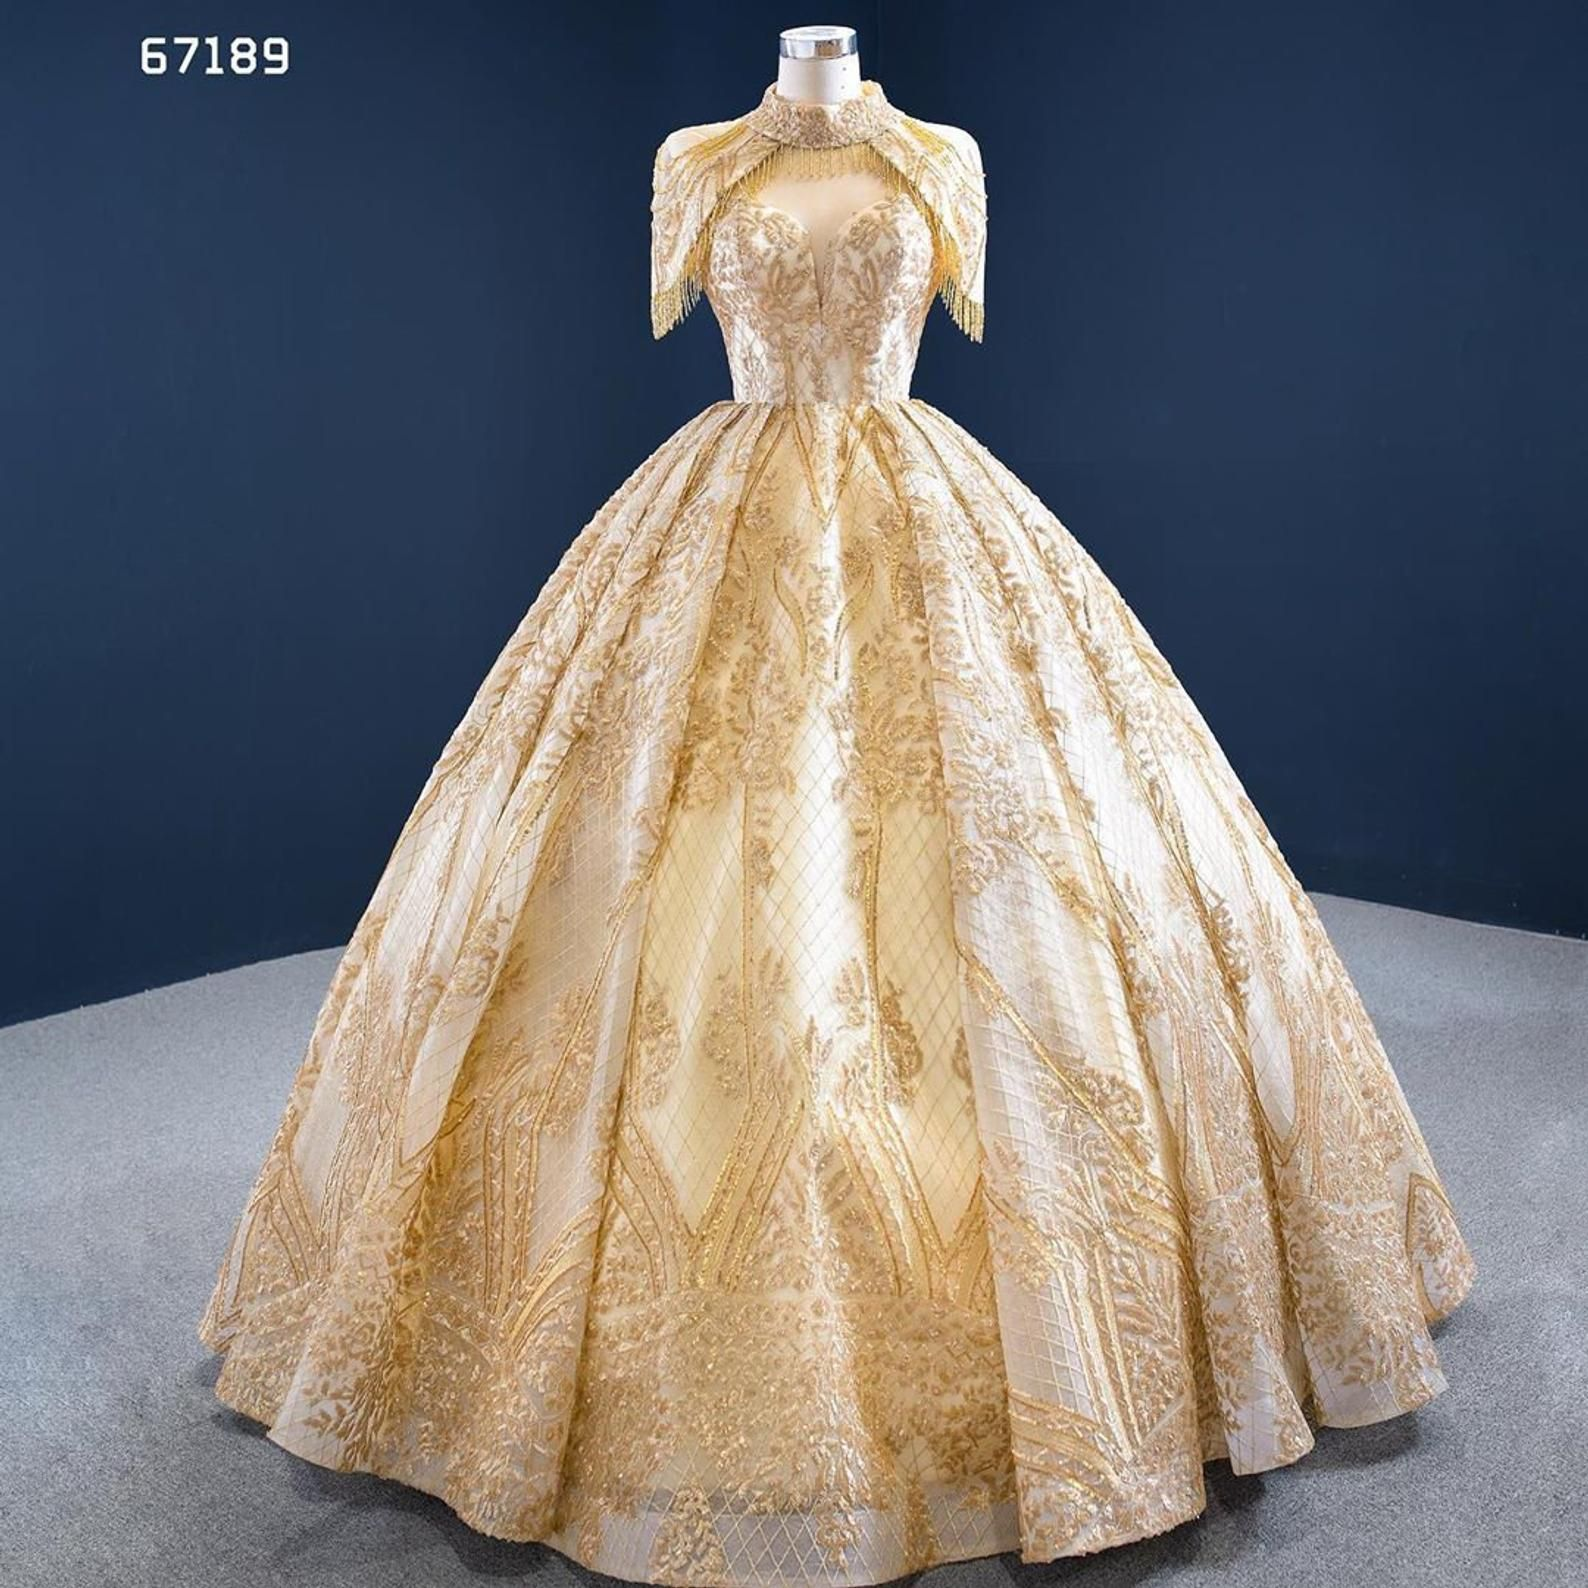 Freya Beaded Gold Tassel High Neck Ball Gown Weddi